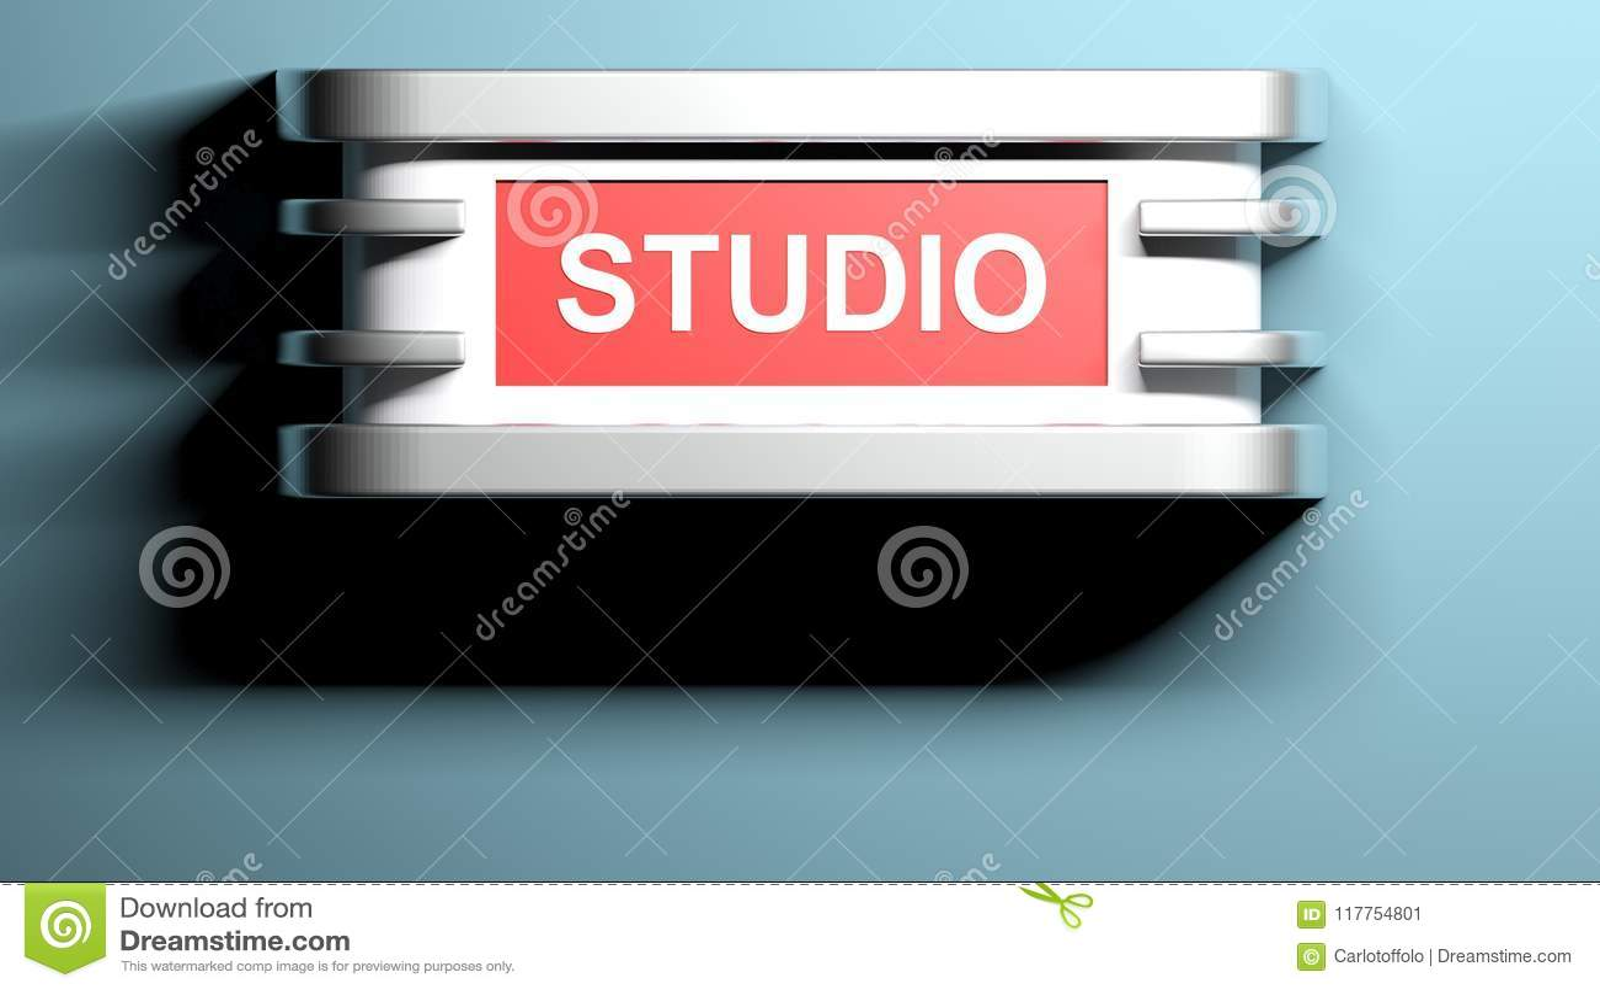 Studio applique lamp at blue wall 3d rendering stock illustration